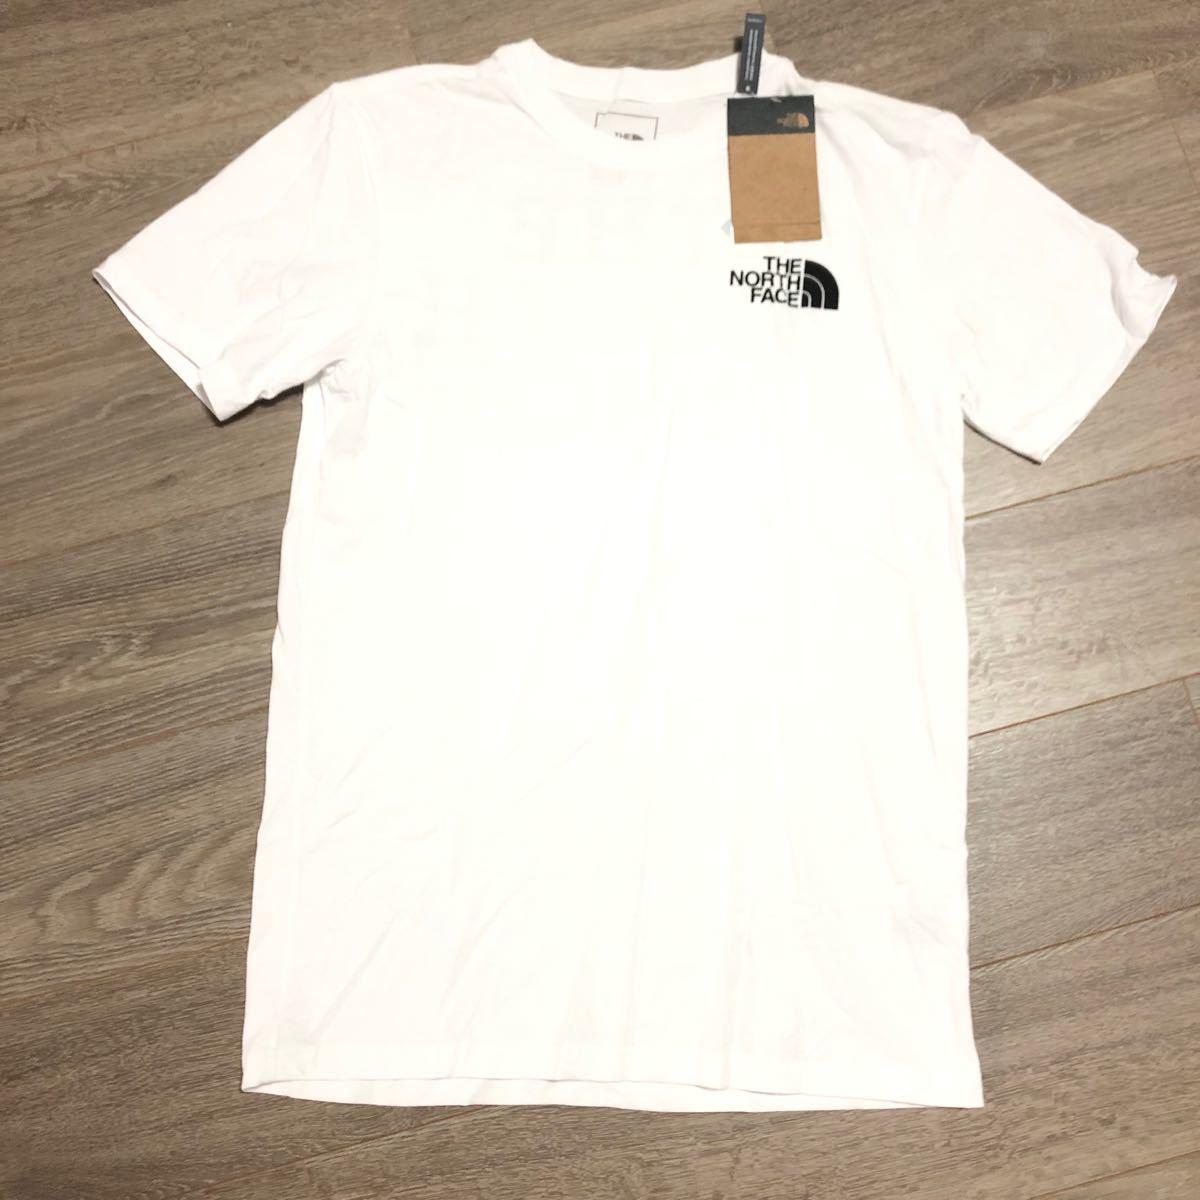 THE NORTH FACE タグ付き ザノースフェイス 半袖Tシャツ WHITE ノースフェイスTシャツ